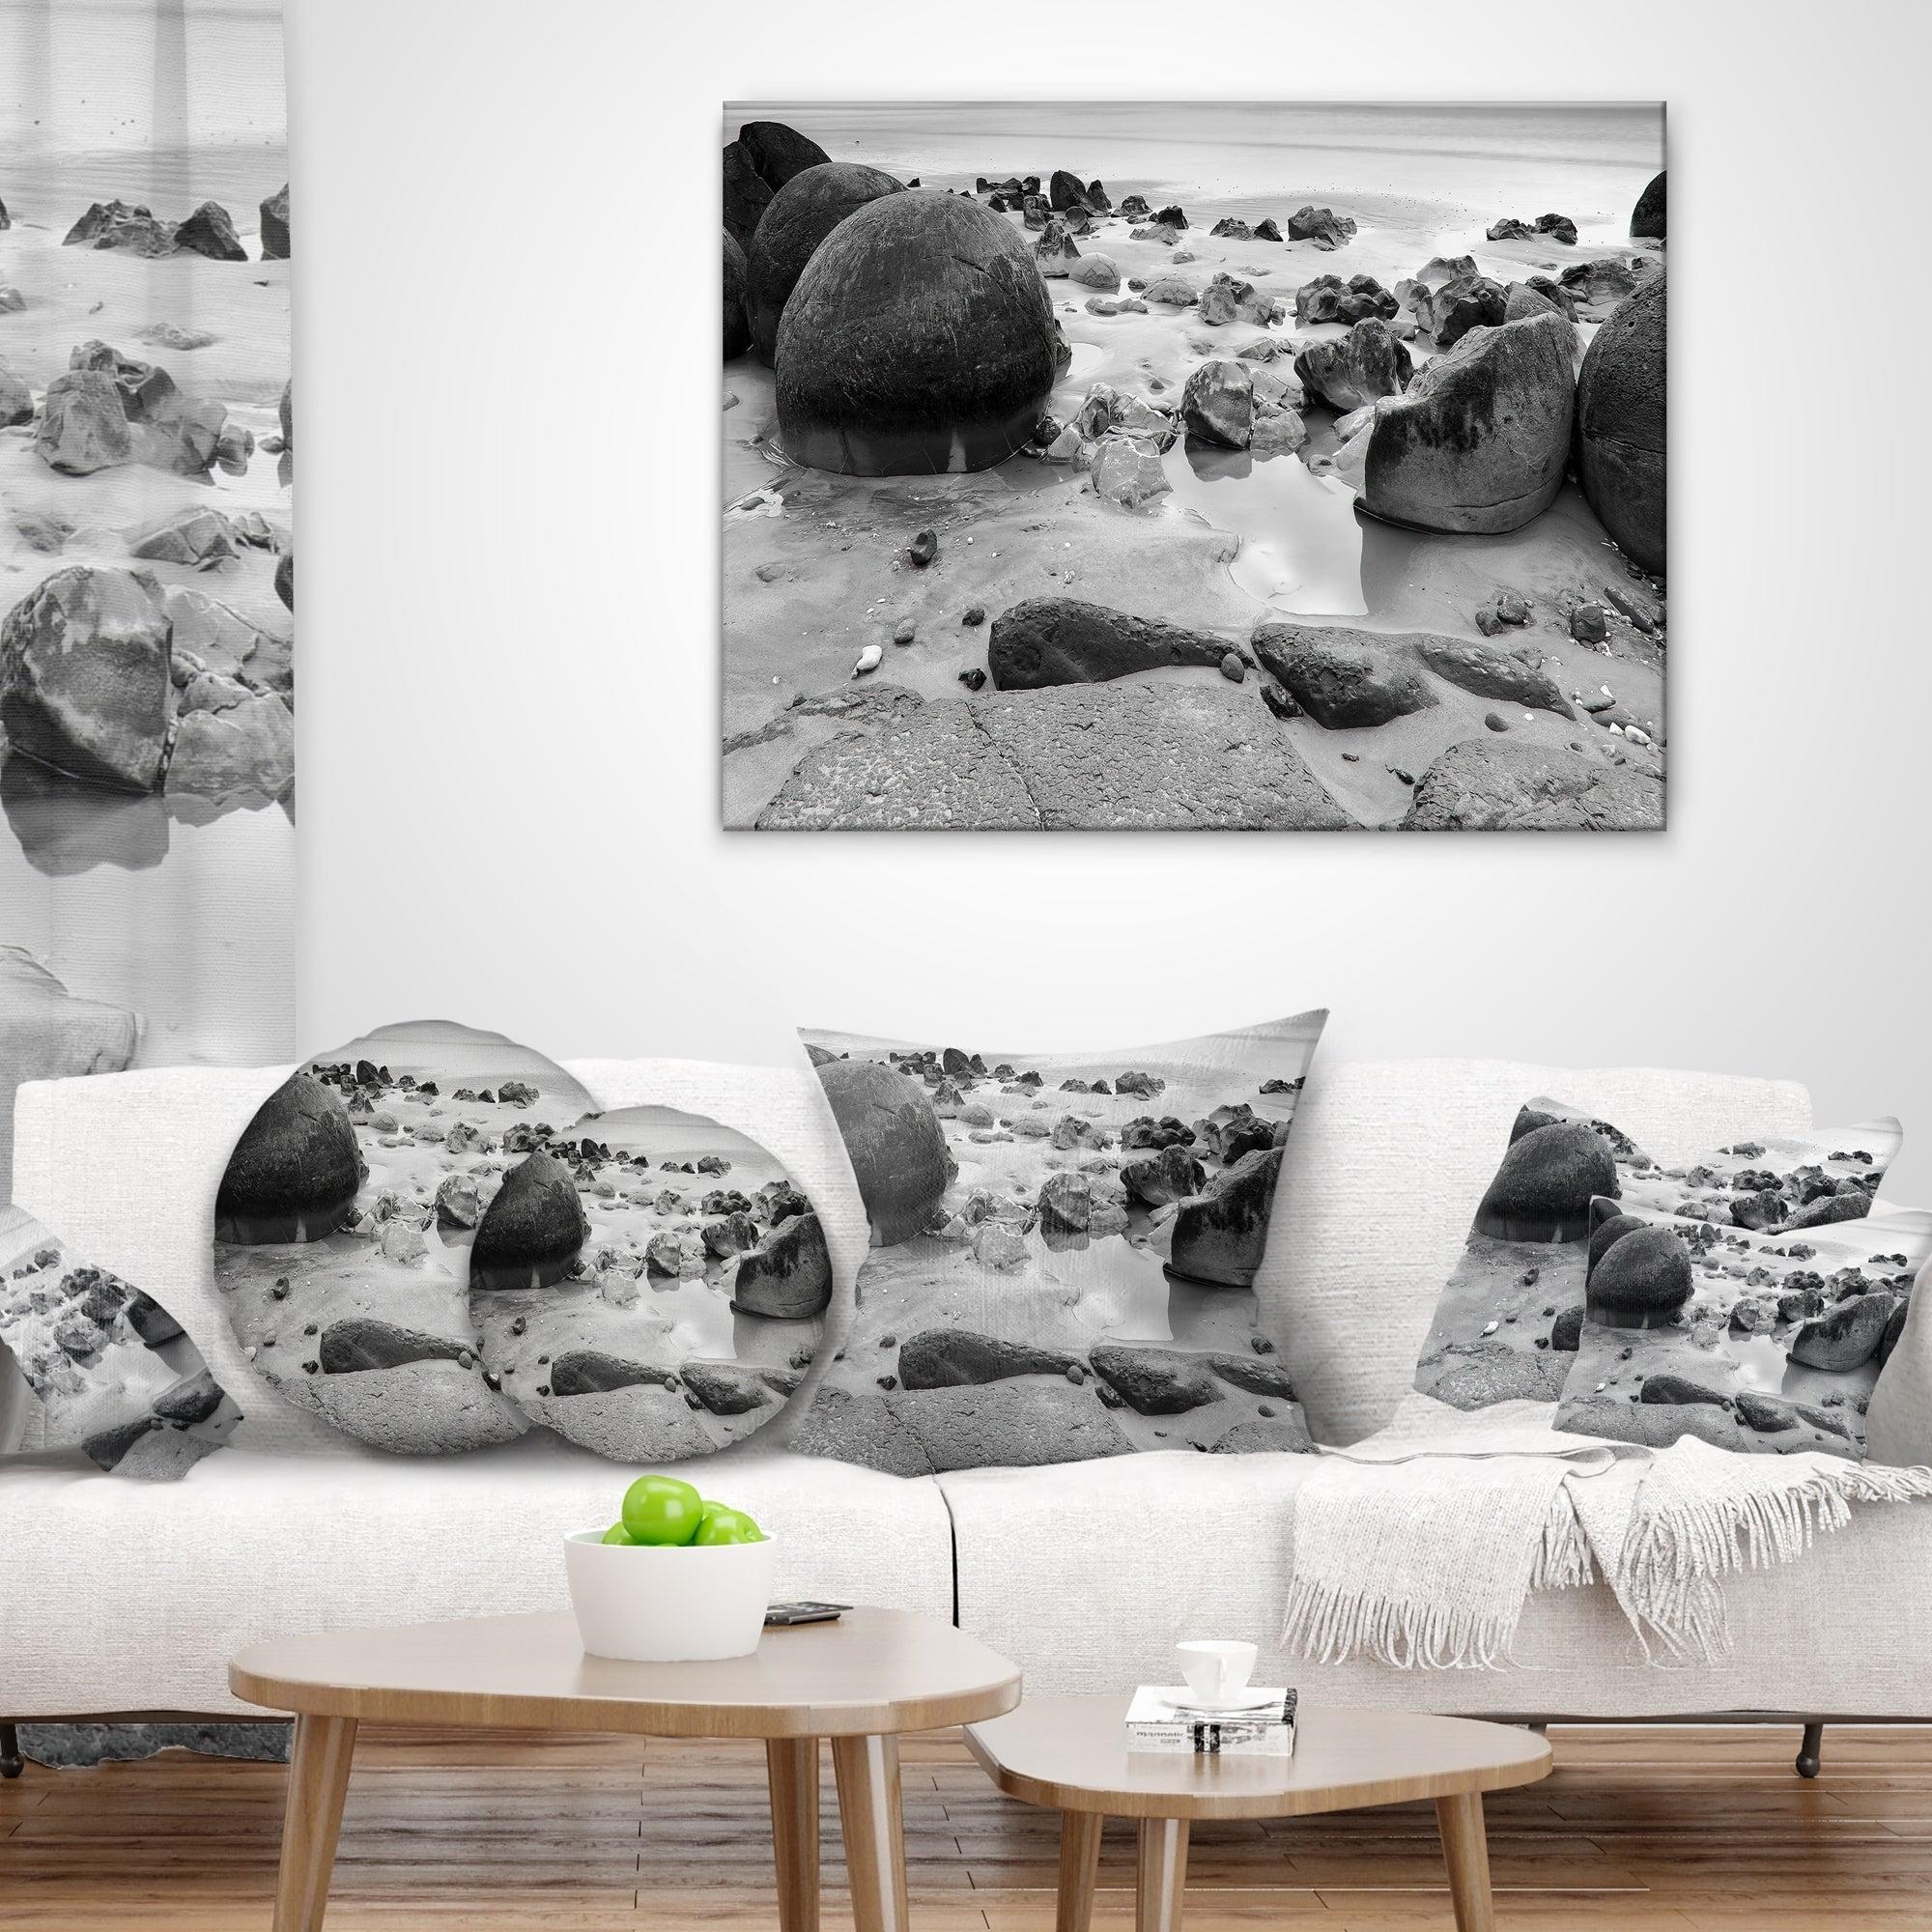 Designart CU9448-12-20 Moeraki Boulders Black n White Seashore Photo Lumbar Cushion Cover for Living Room x 20 in Insert Printed On Both Side Sofa Throw Pillow 12 in in